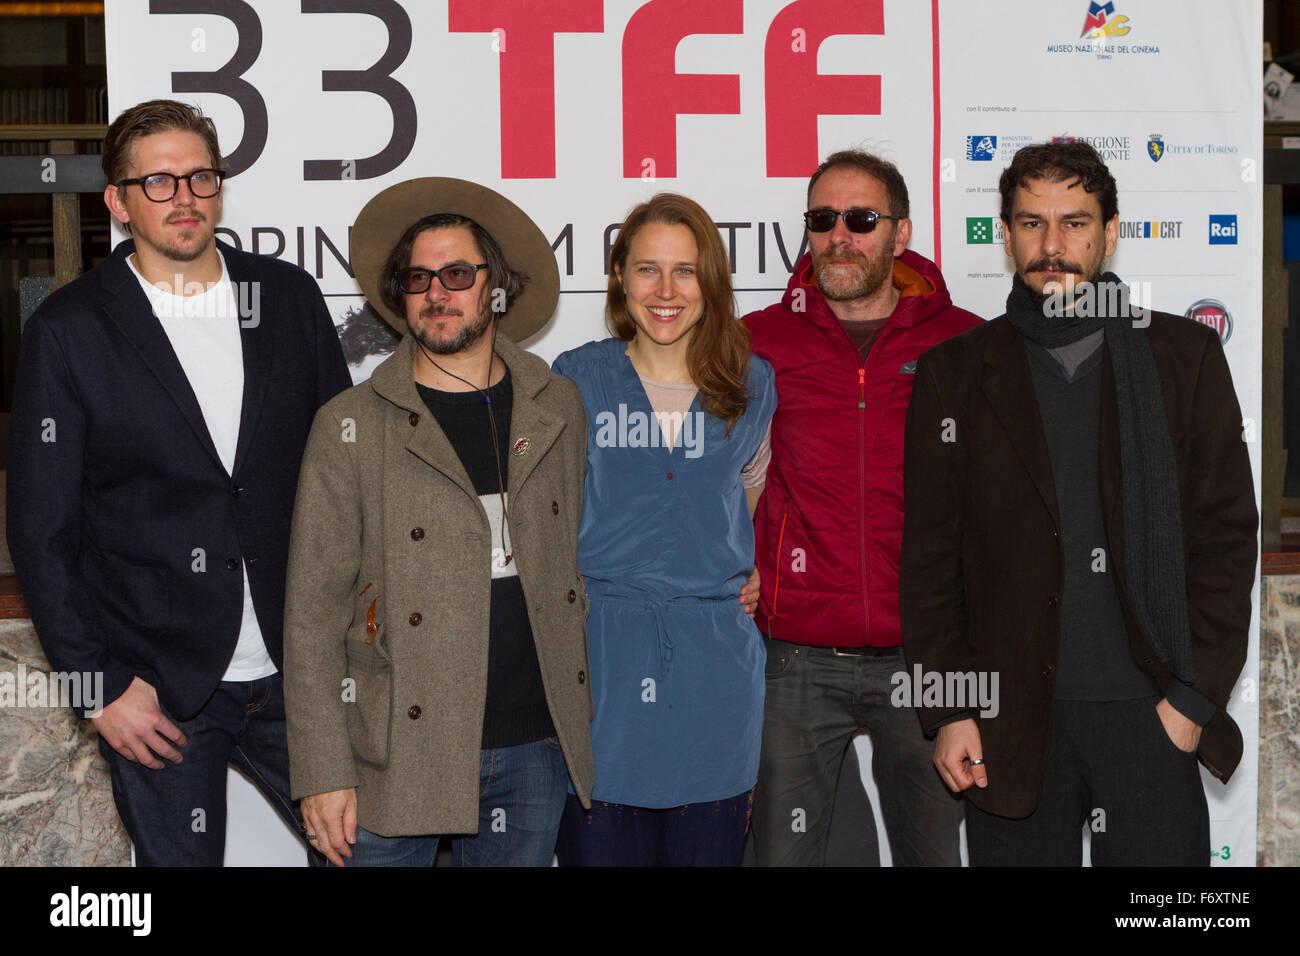 Torino, Italy. 21st November 2015. The jury of Torino Film Festival: (from left to right) Jan Ole Gerster, Corin - Stock Image